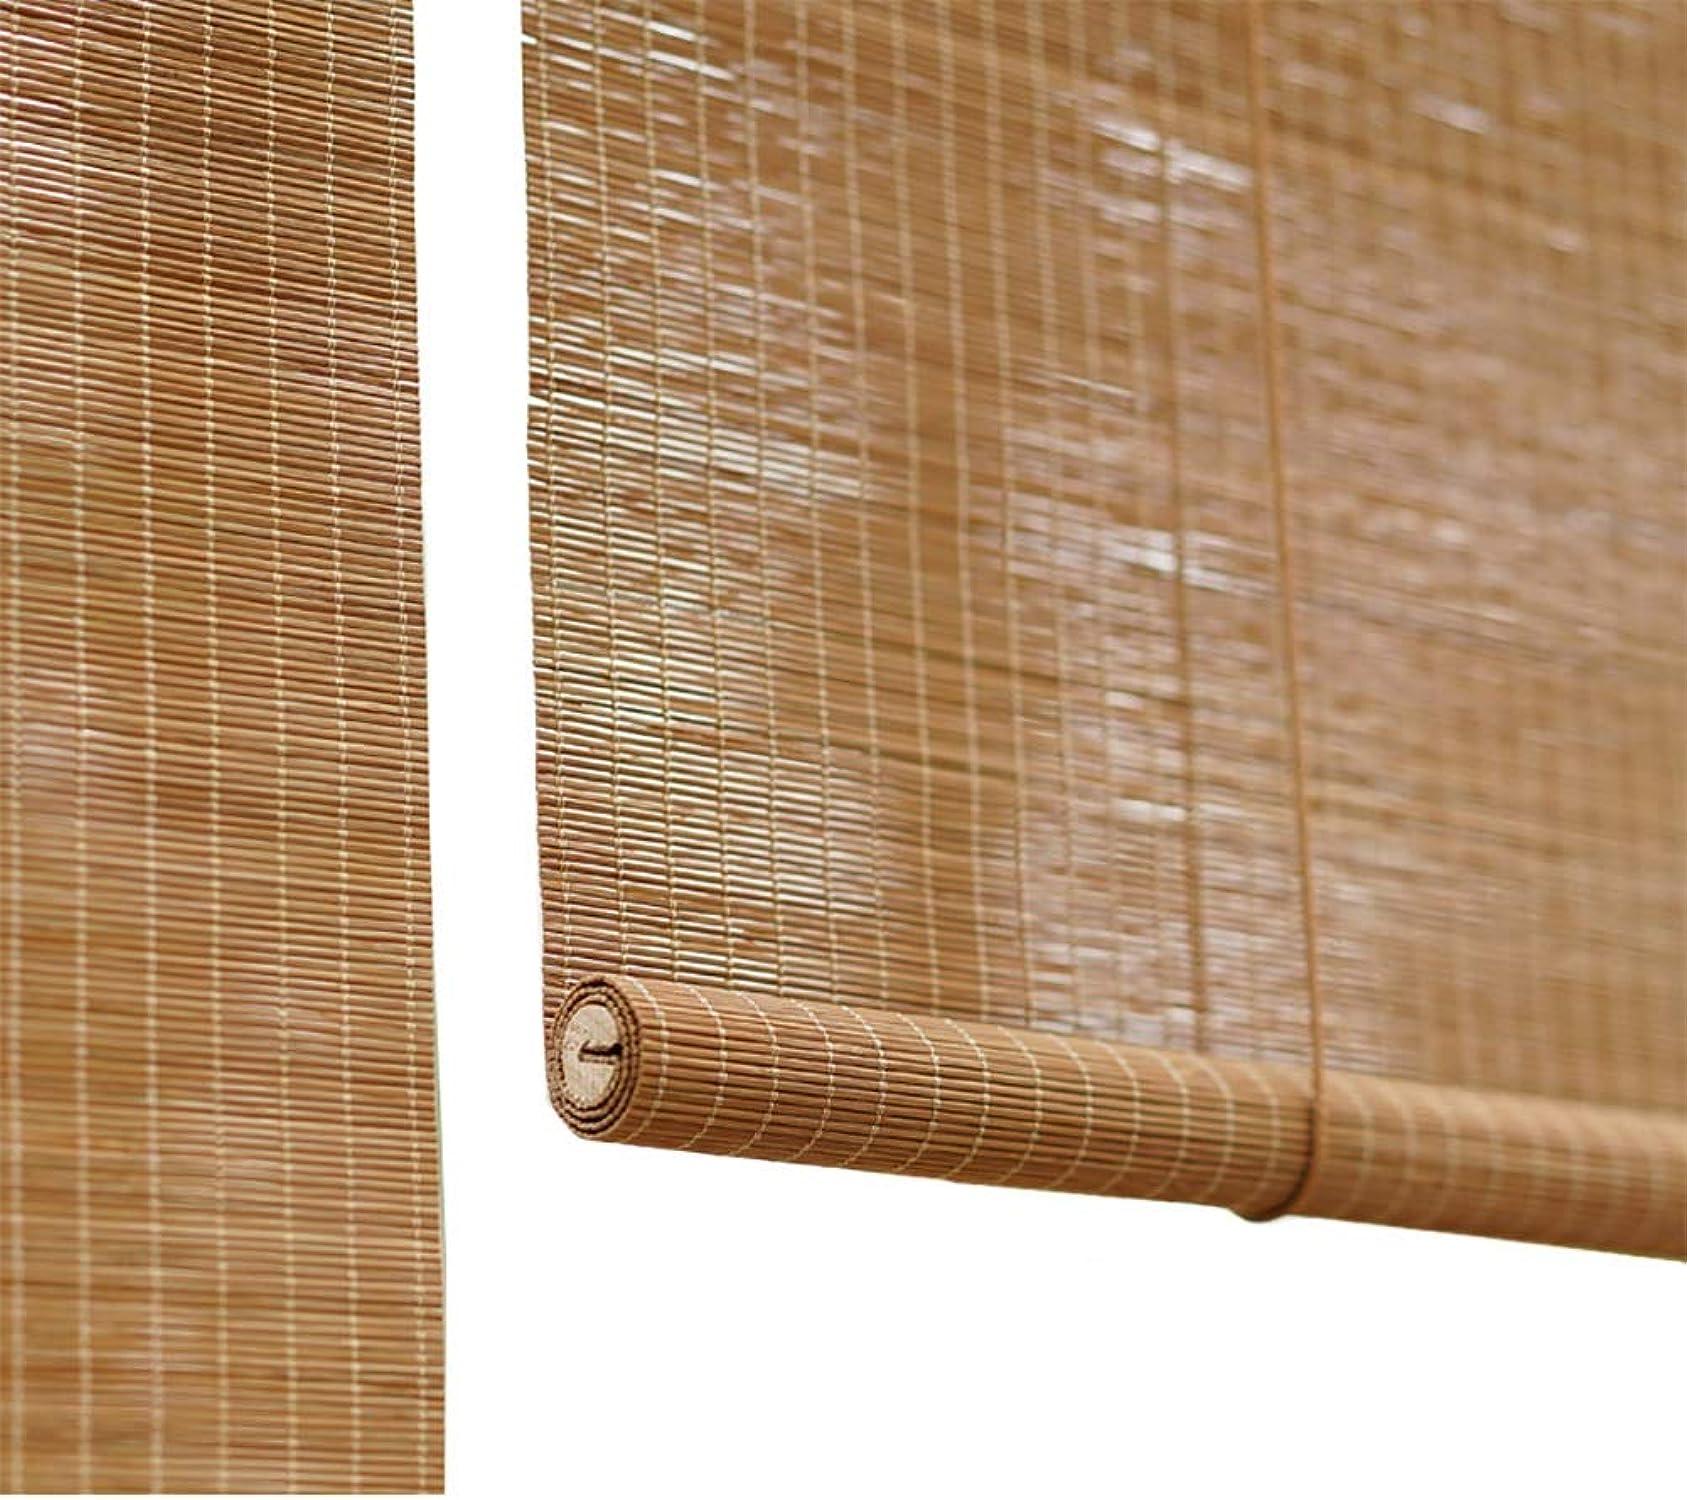 presentando toda la última moda de la calle Persianas Persianas Persianas Privacidad, Enrollables De Bambú para Porche Balcón Puertas Salón De Té, 60% Filtro De Luz (Tamaño   80×160cm)  forma única